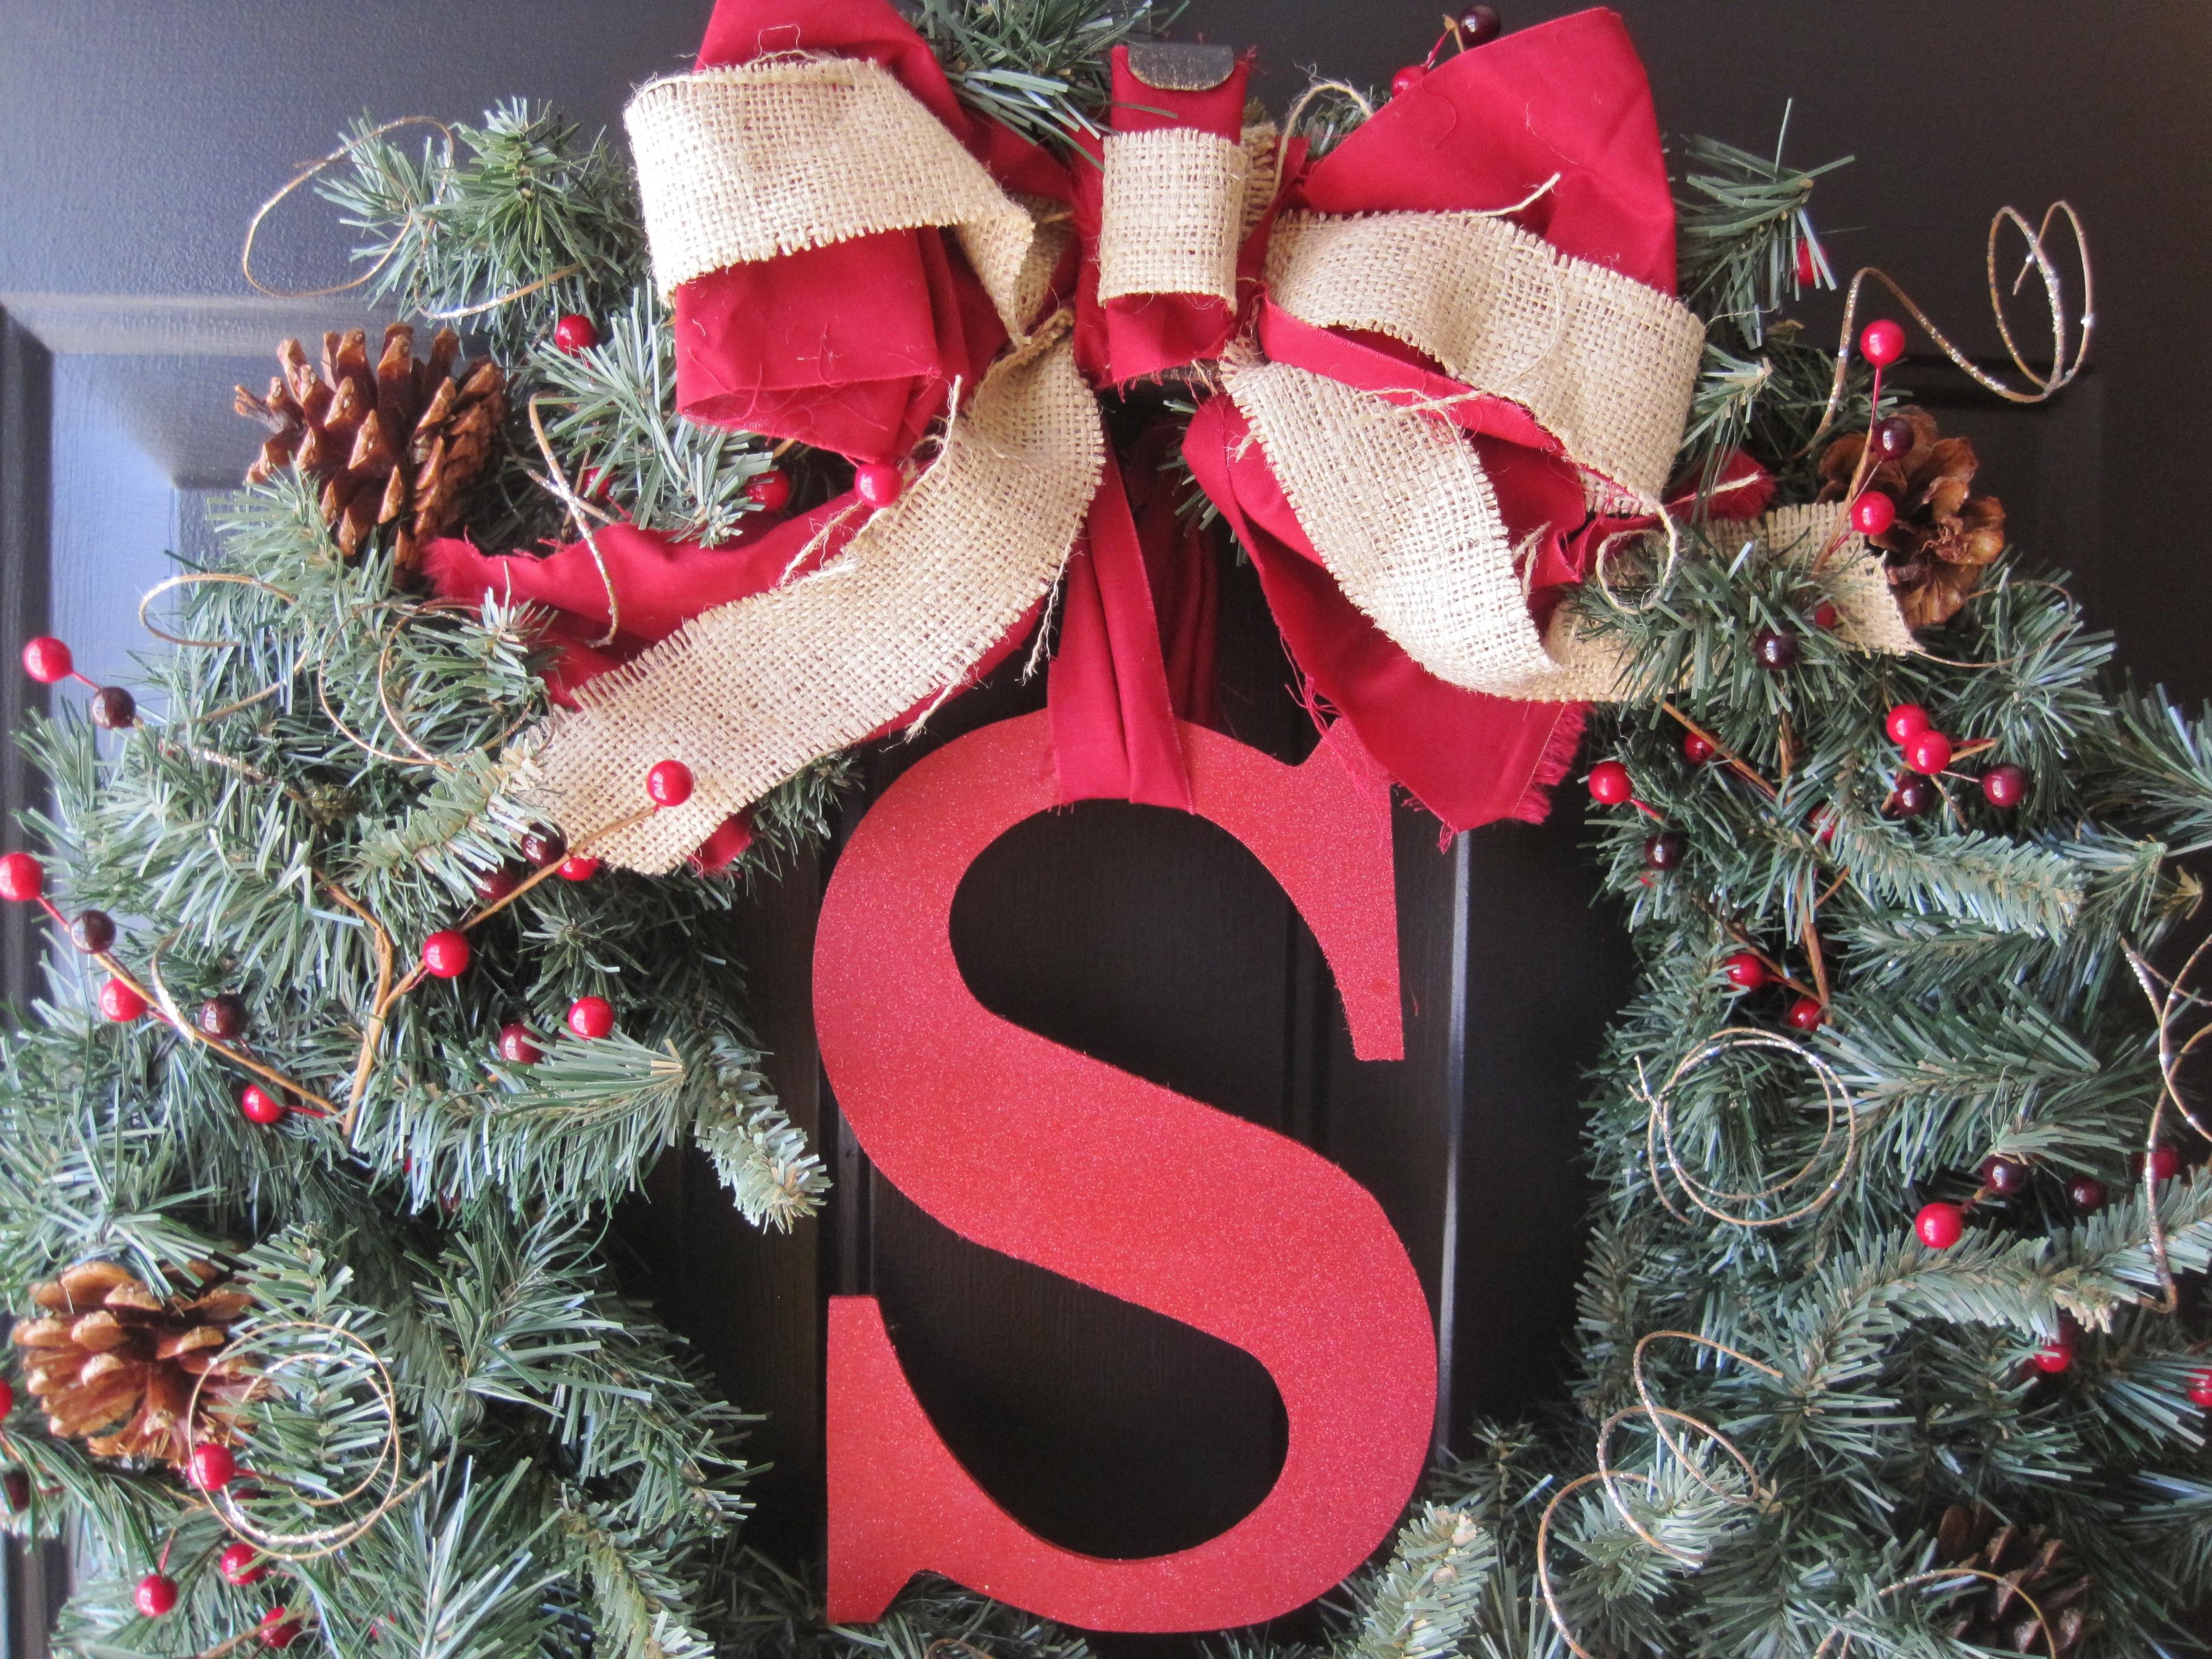 The Winning Wreath (EASY DIY Monogram Holiday Wreath) - Loving Here